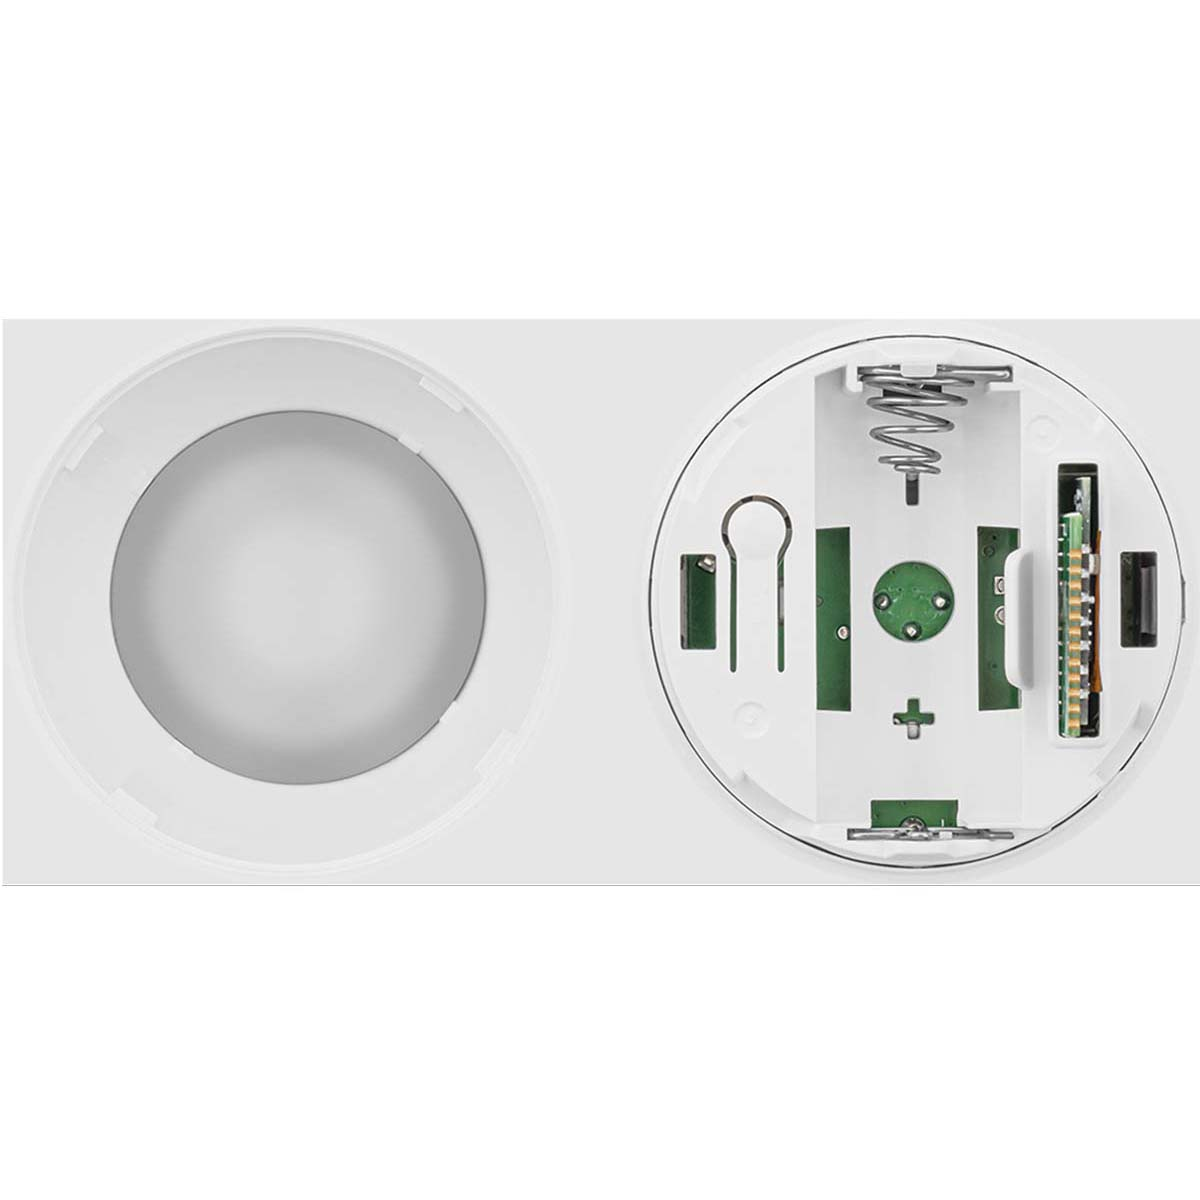 Kit 05 Sensor De Movimento Intelbras Smart Ism 1001